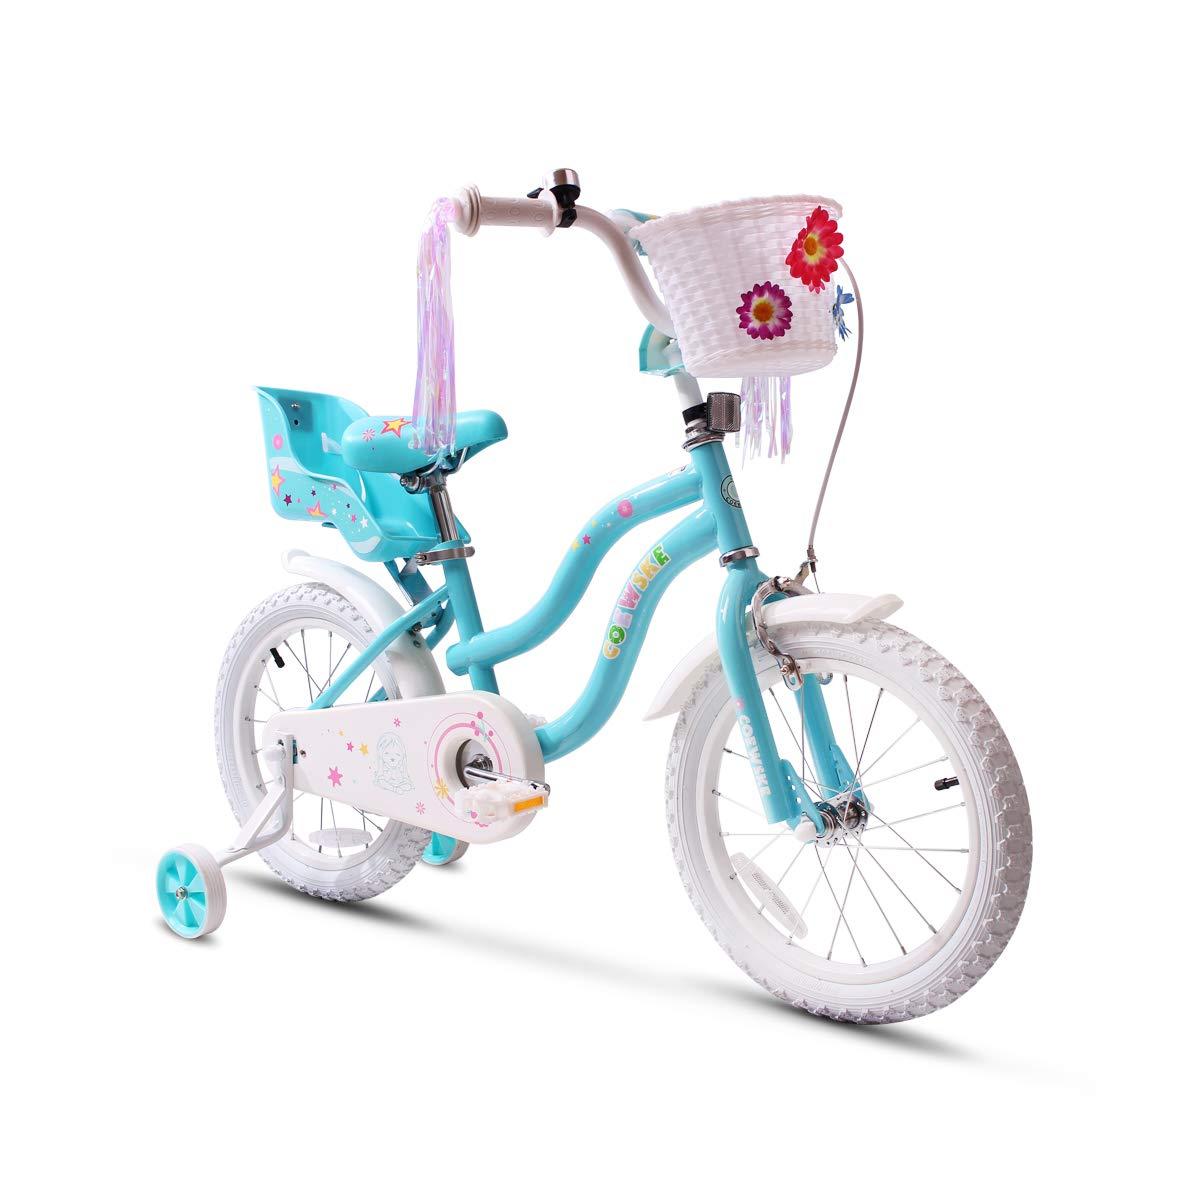 COEWSKE Kid's Bike Steel Frame Children Bicycle Little Princess Style 14-16 Inch with Training Wheel(14'' Blue)